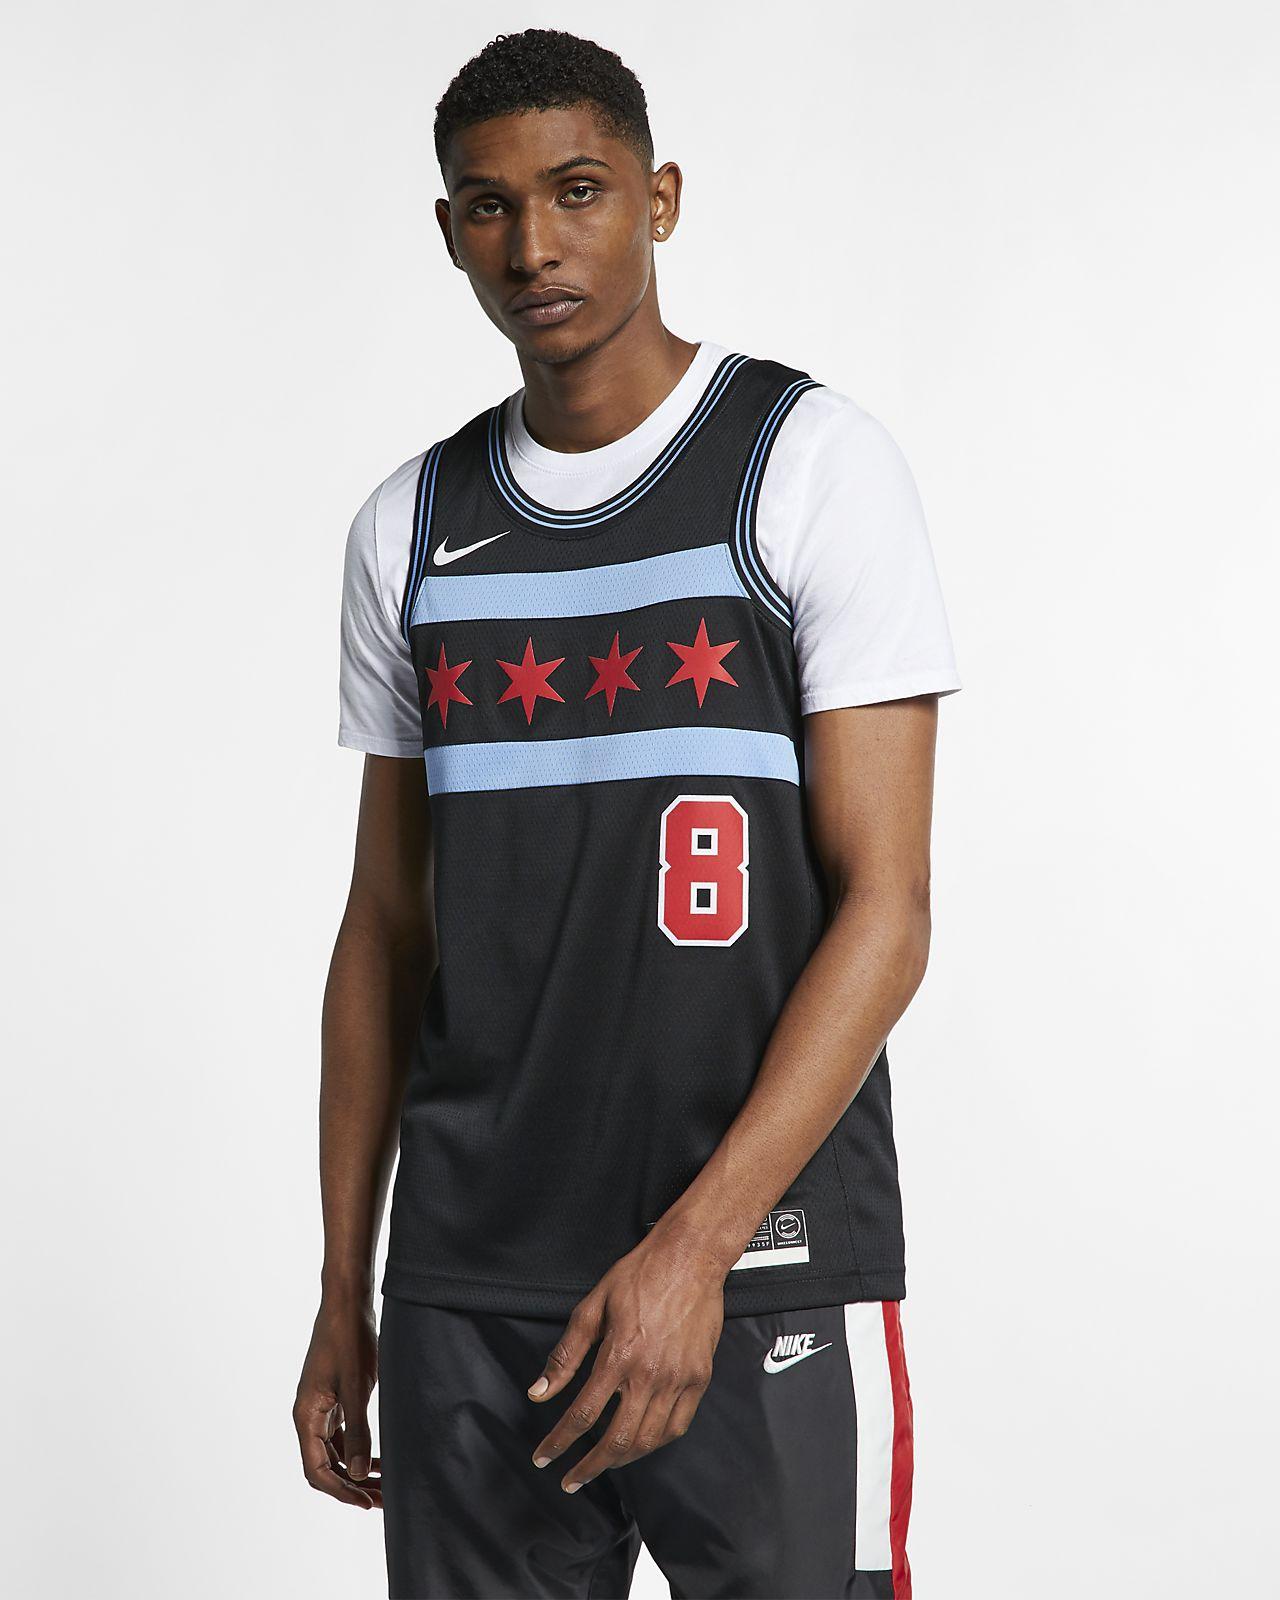 Zach LaVine City Edition Swingman (Chicago Bulls) Camiseta Nike NBA Connected - Hombre